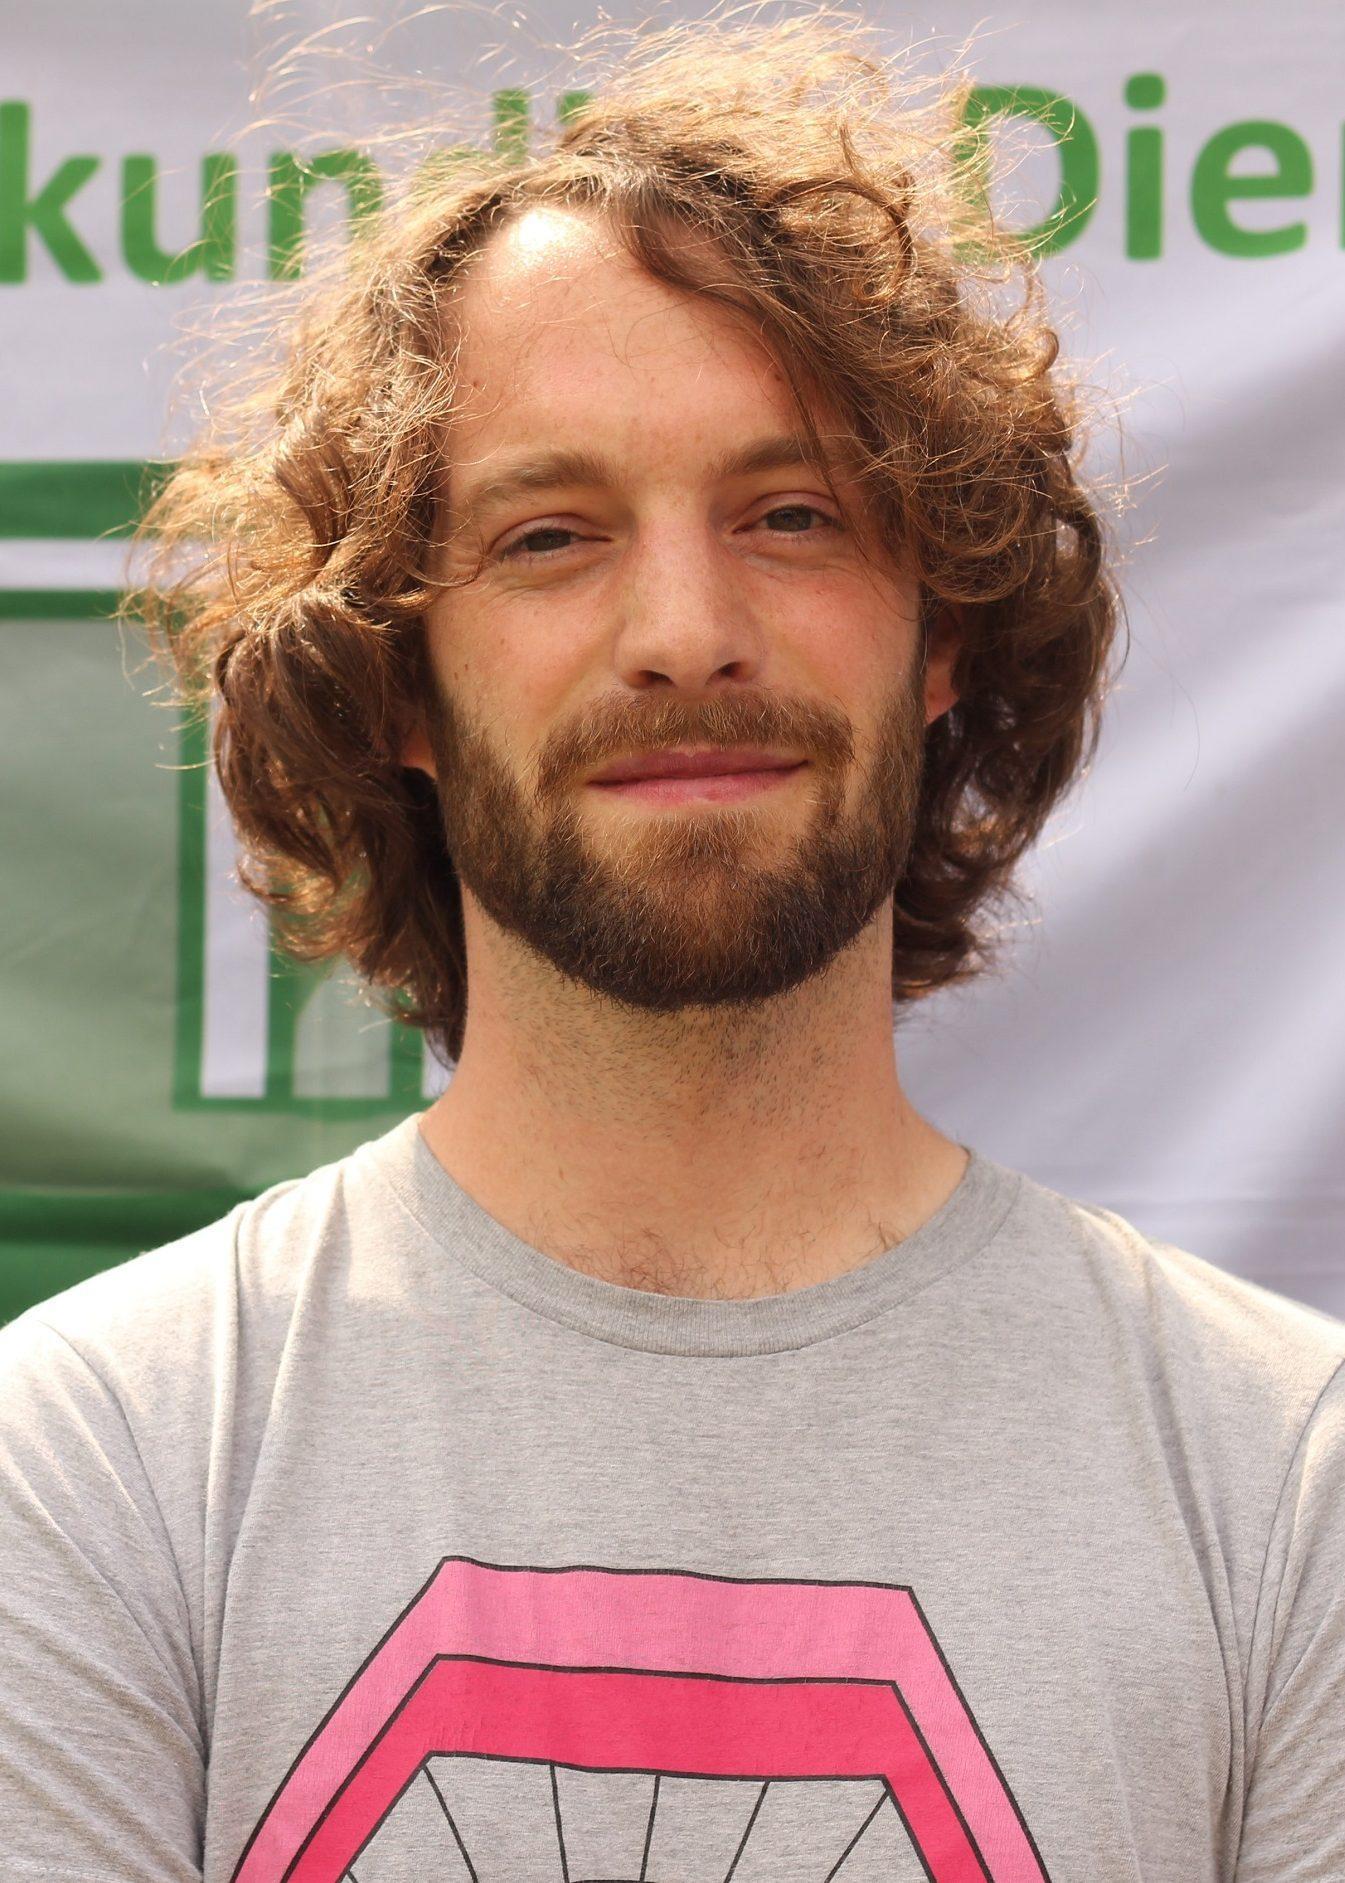 Tom Coussement